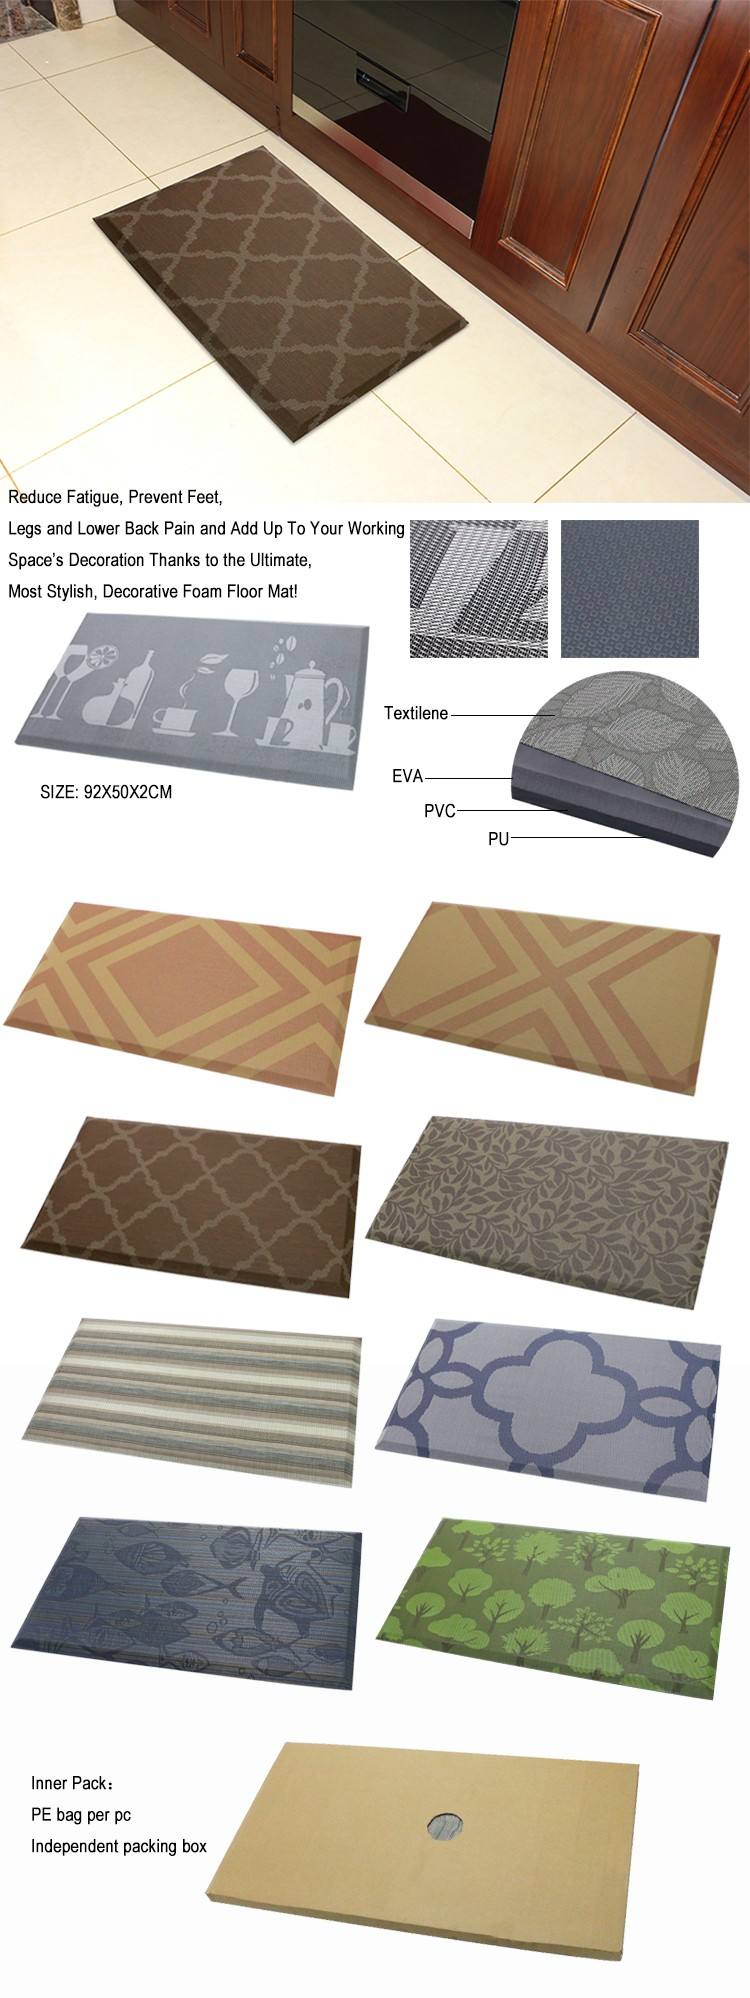 Comfort Anti Fatigue Pvc Foam Office Standing Desk Mat/kitchen Floor ...